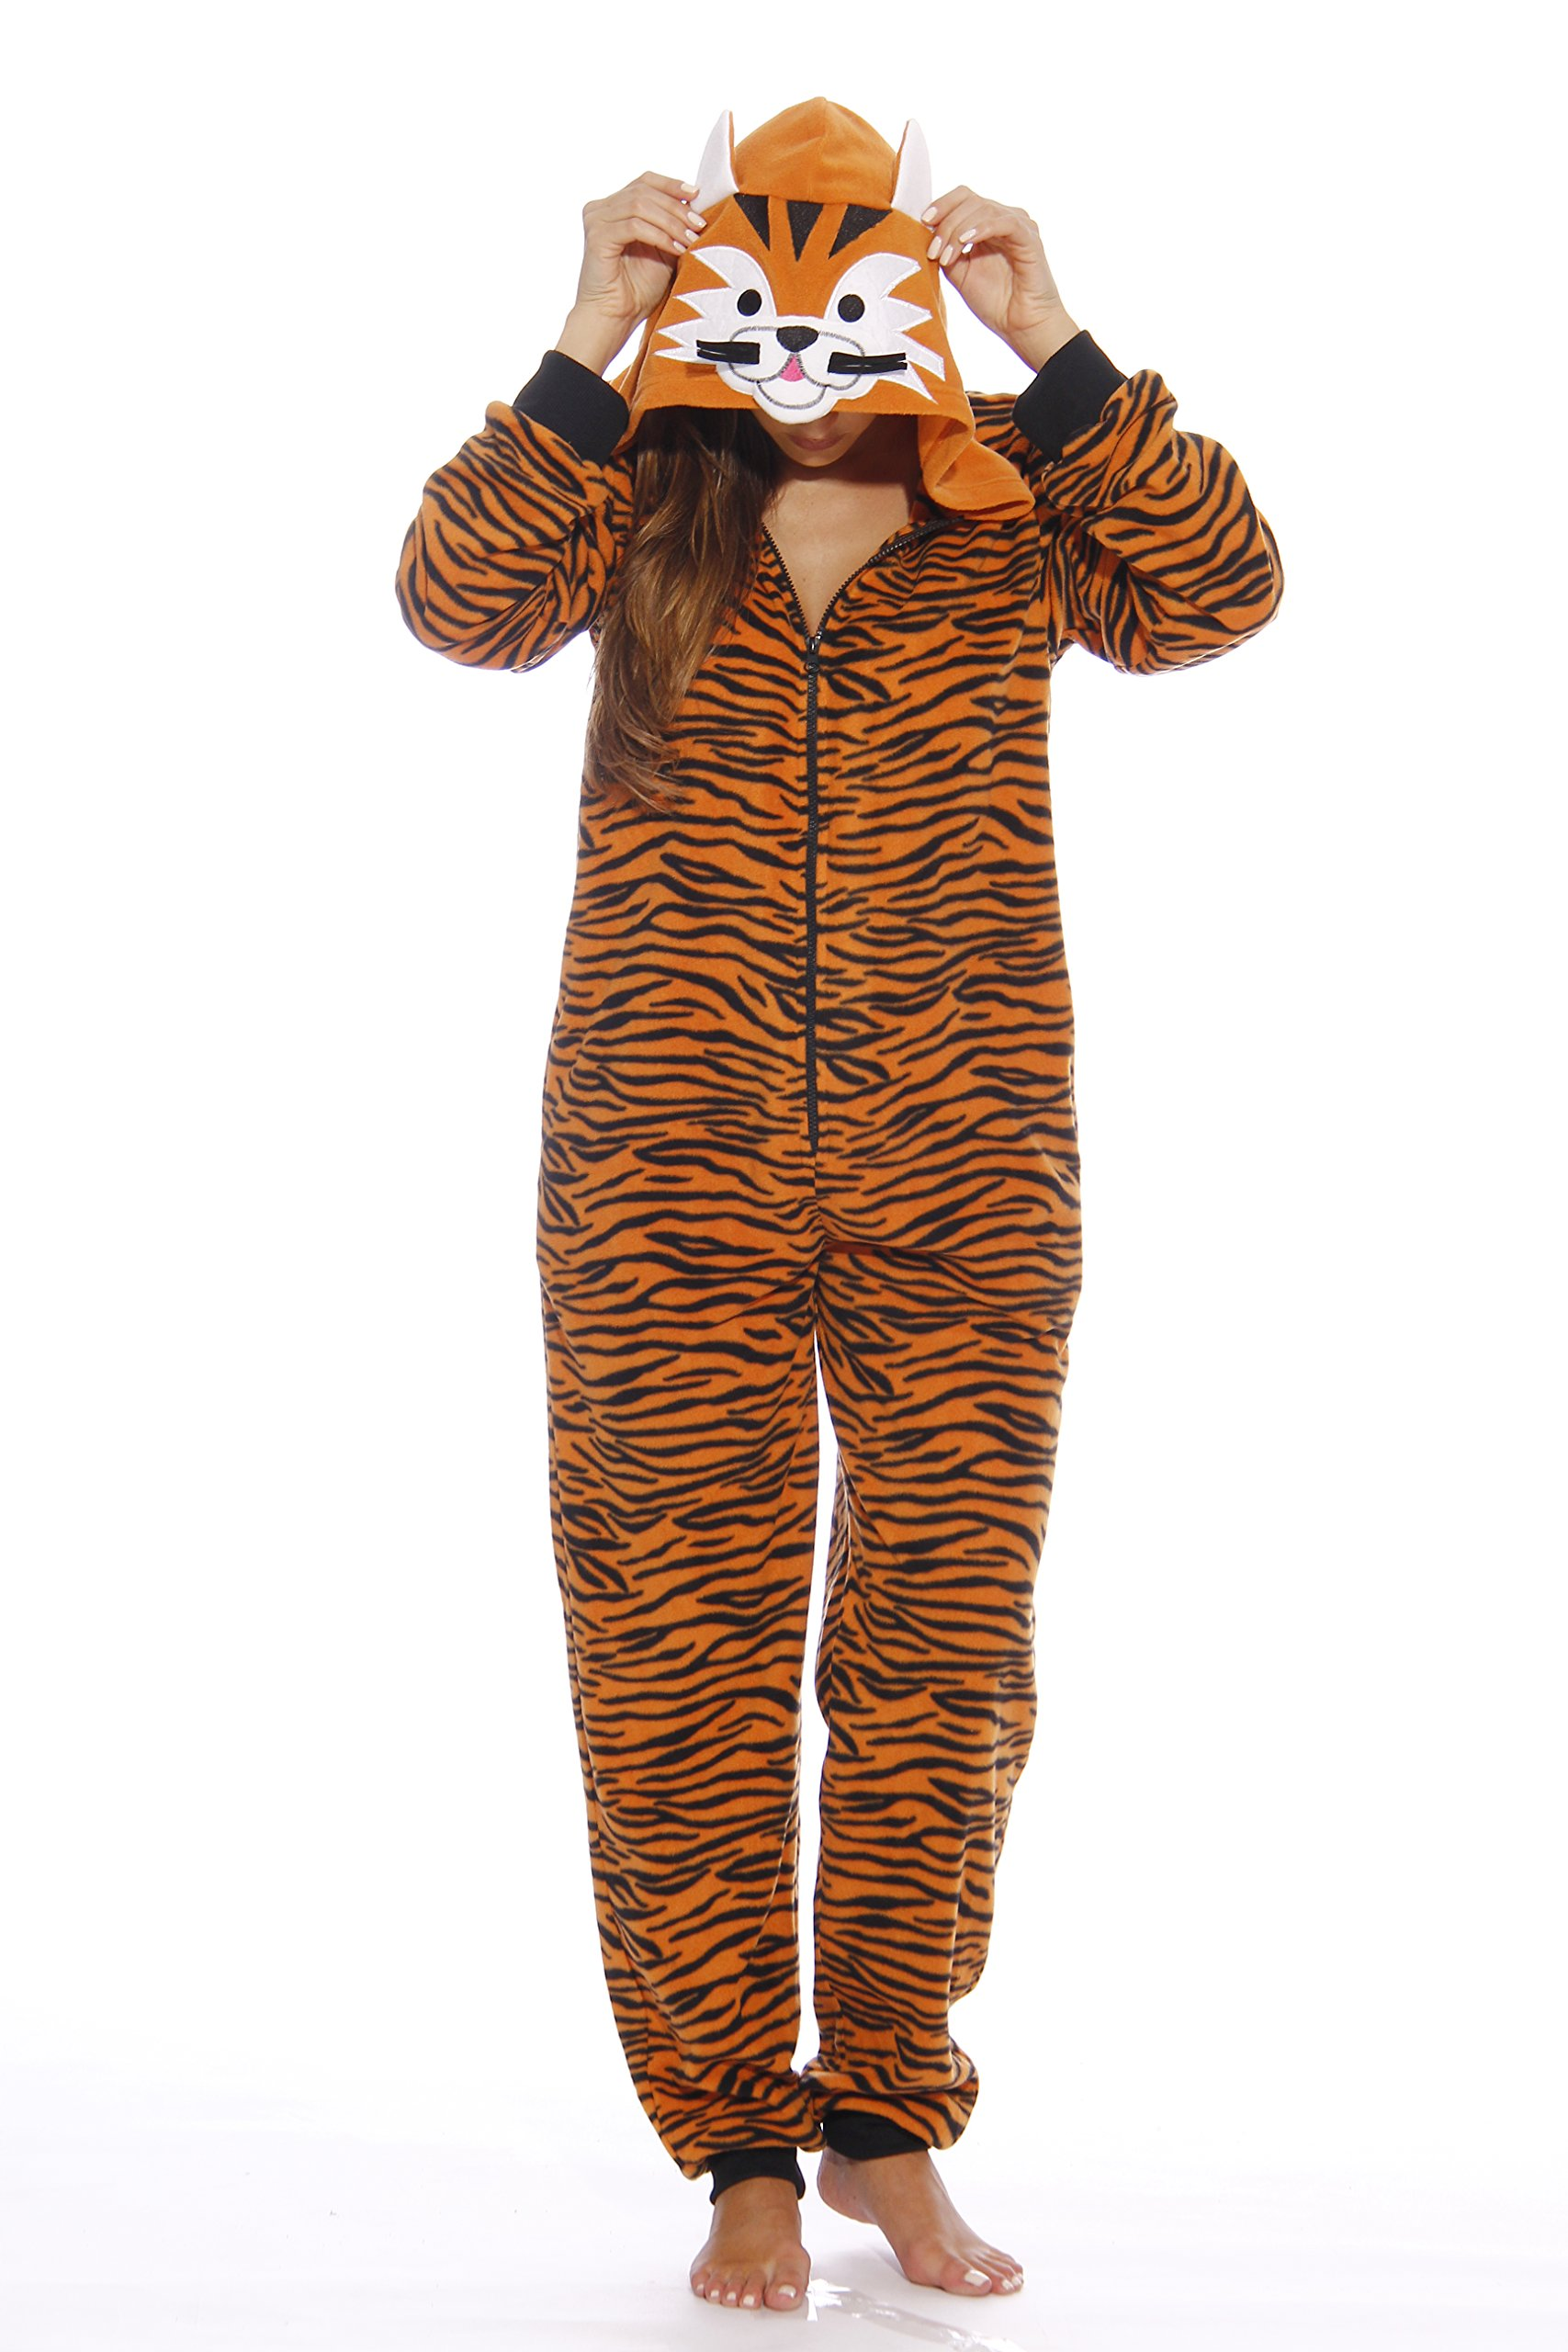 Just Love Adult Onesie / Onesies / Pajamas, Tiger New, Medium